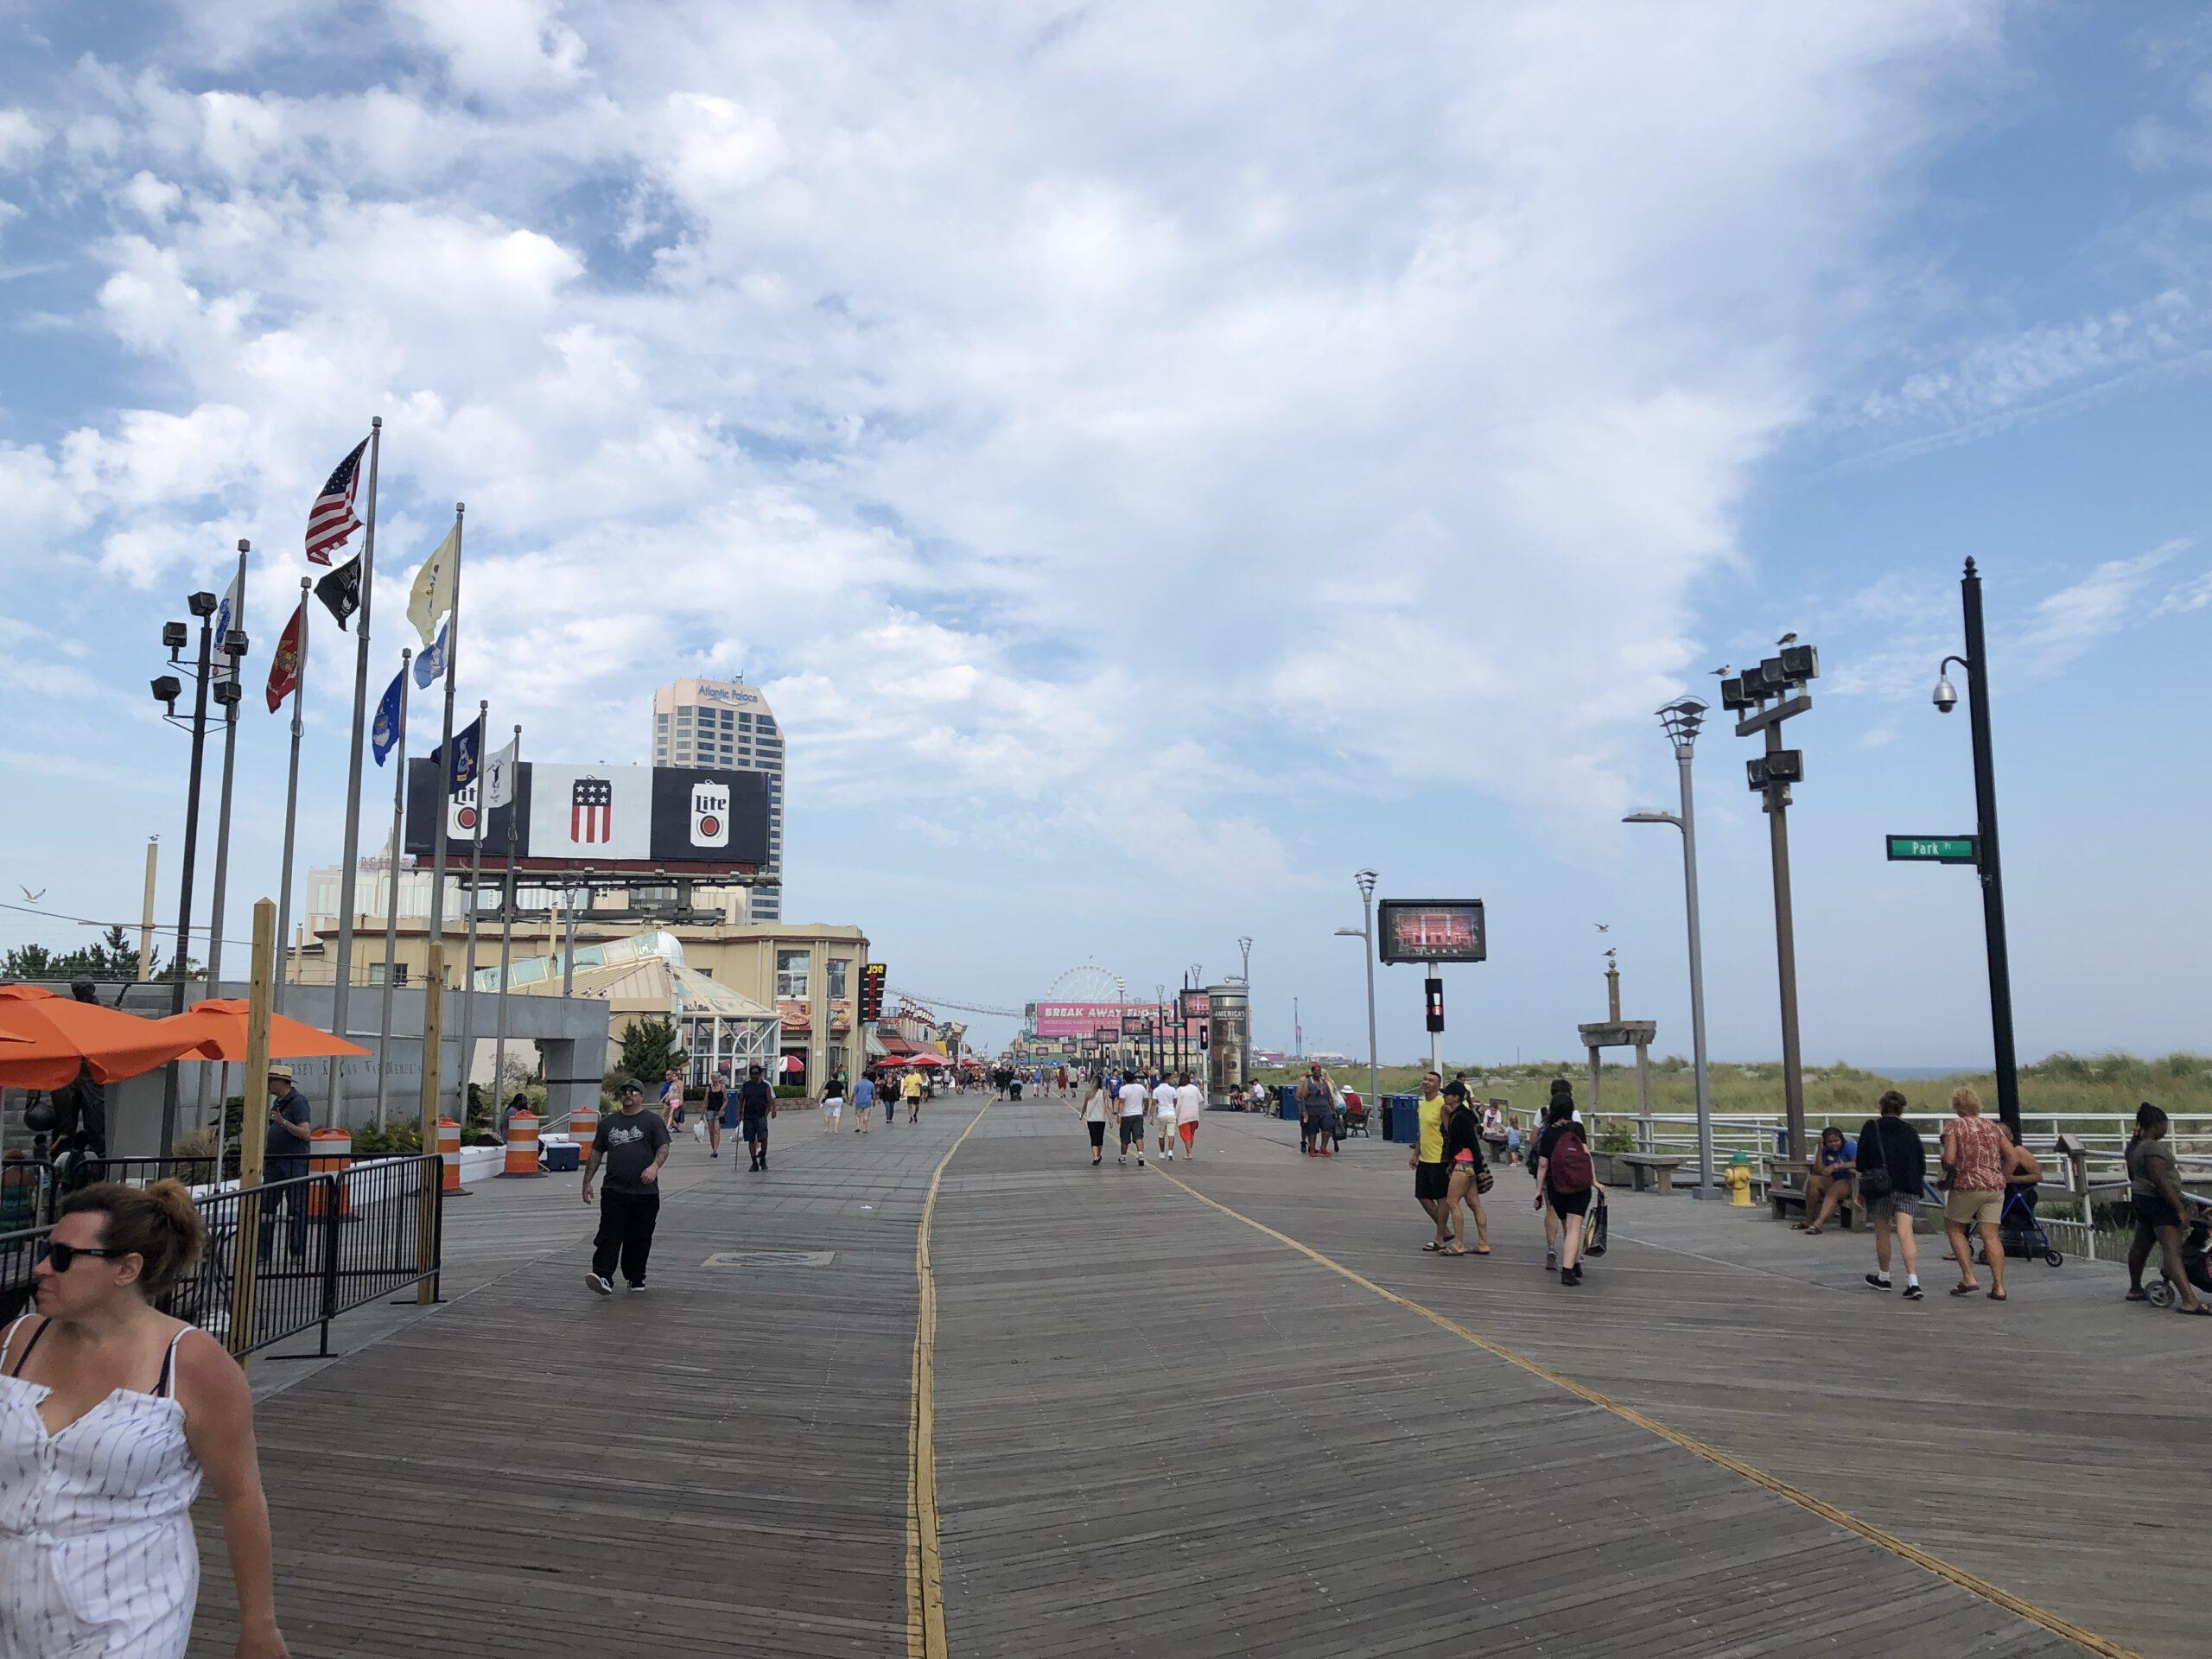 ATLANTIC CITY: Beach & Boardwalk to Remain Open